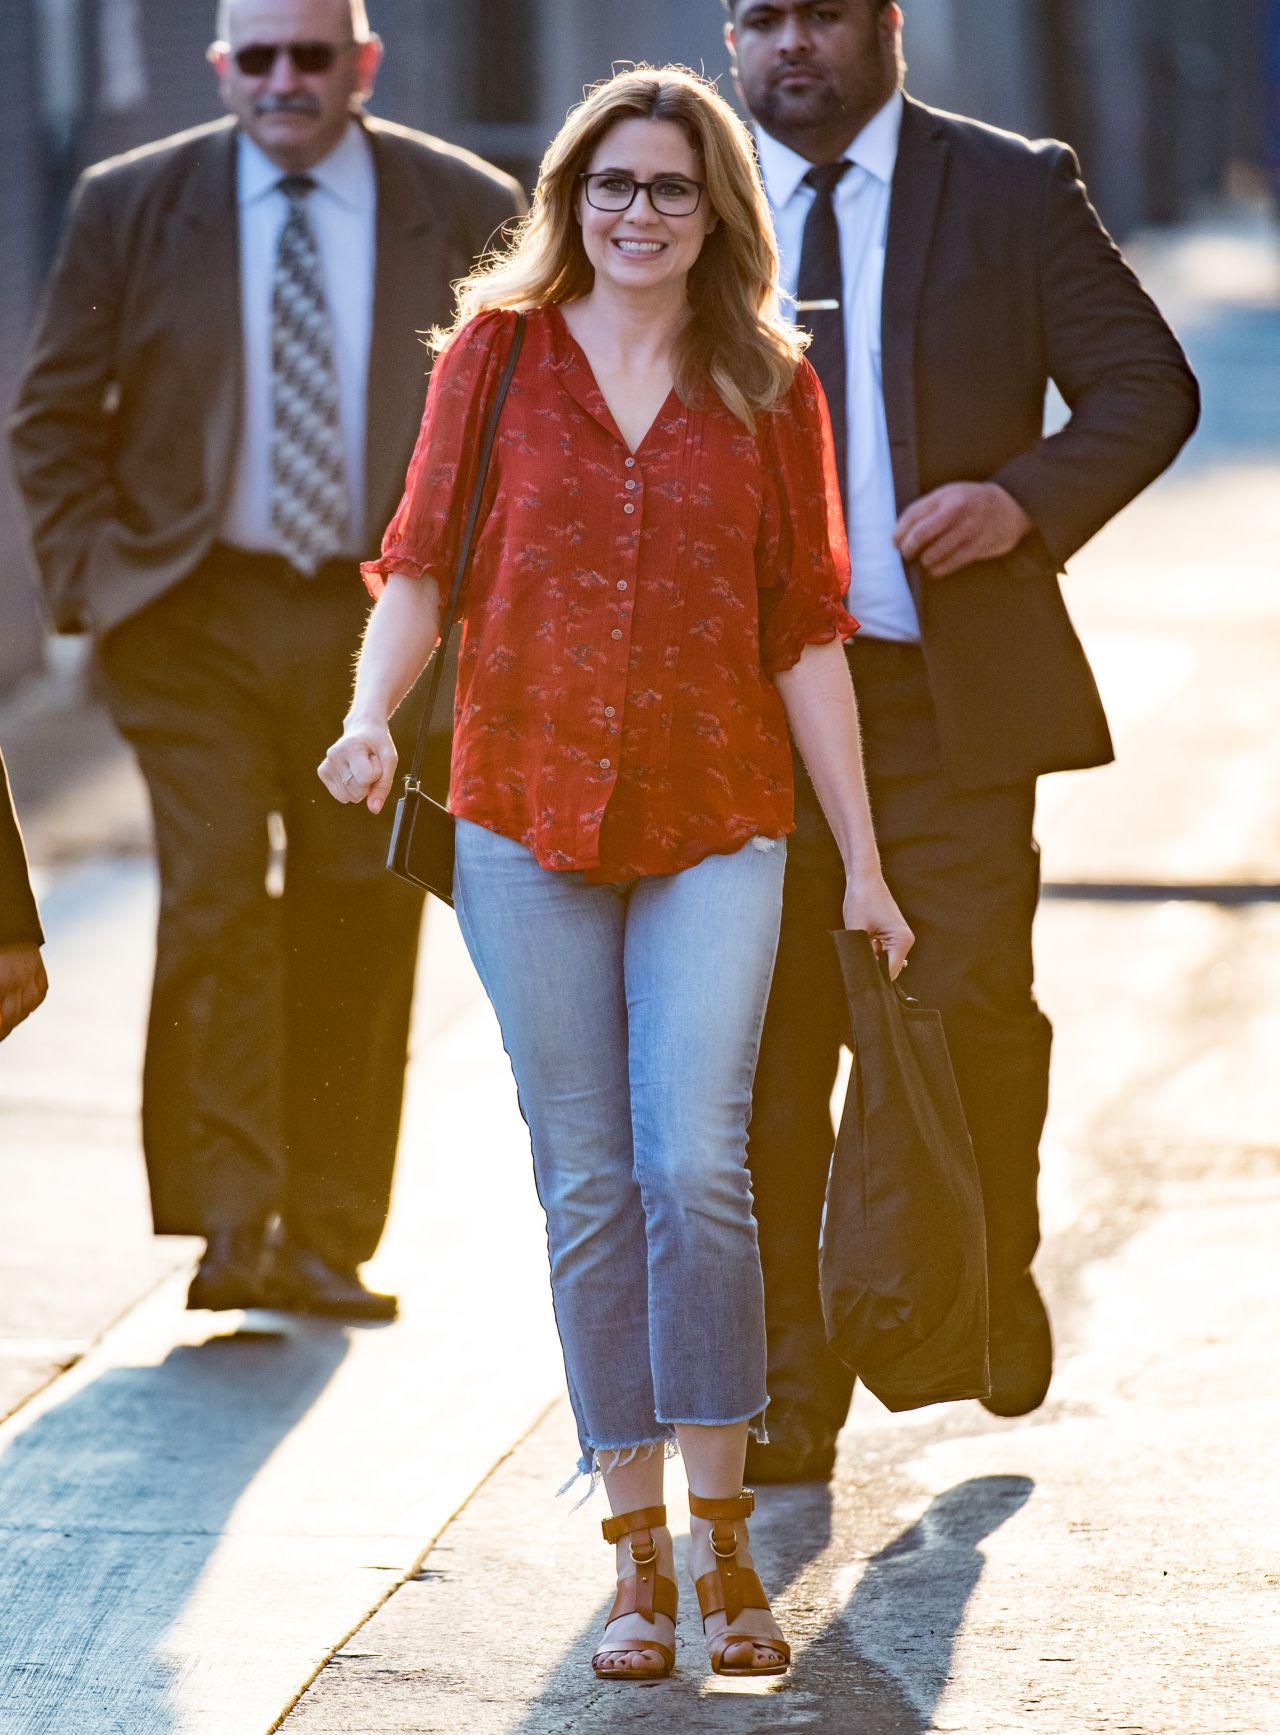 5d4fed3948f81 Jenna Fischer Arrive to Appear on Jimmy Kimmel Live! in LA 04/02/2018